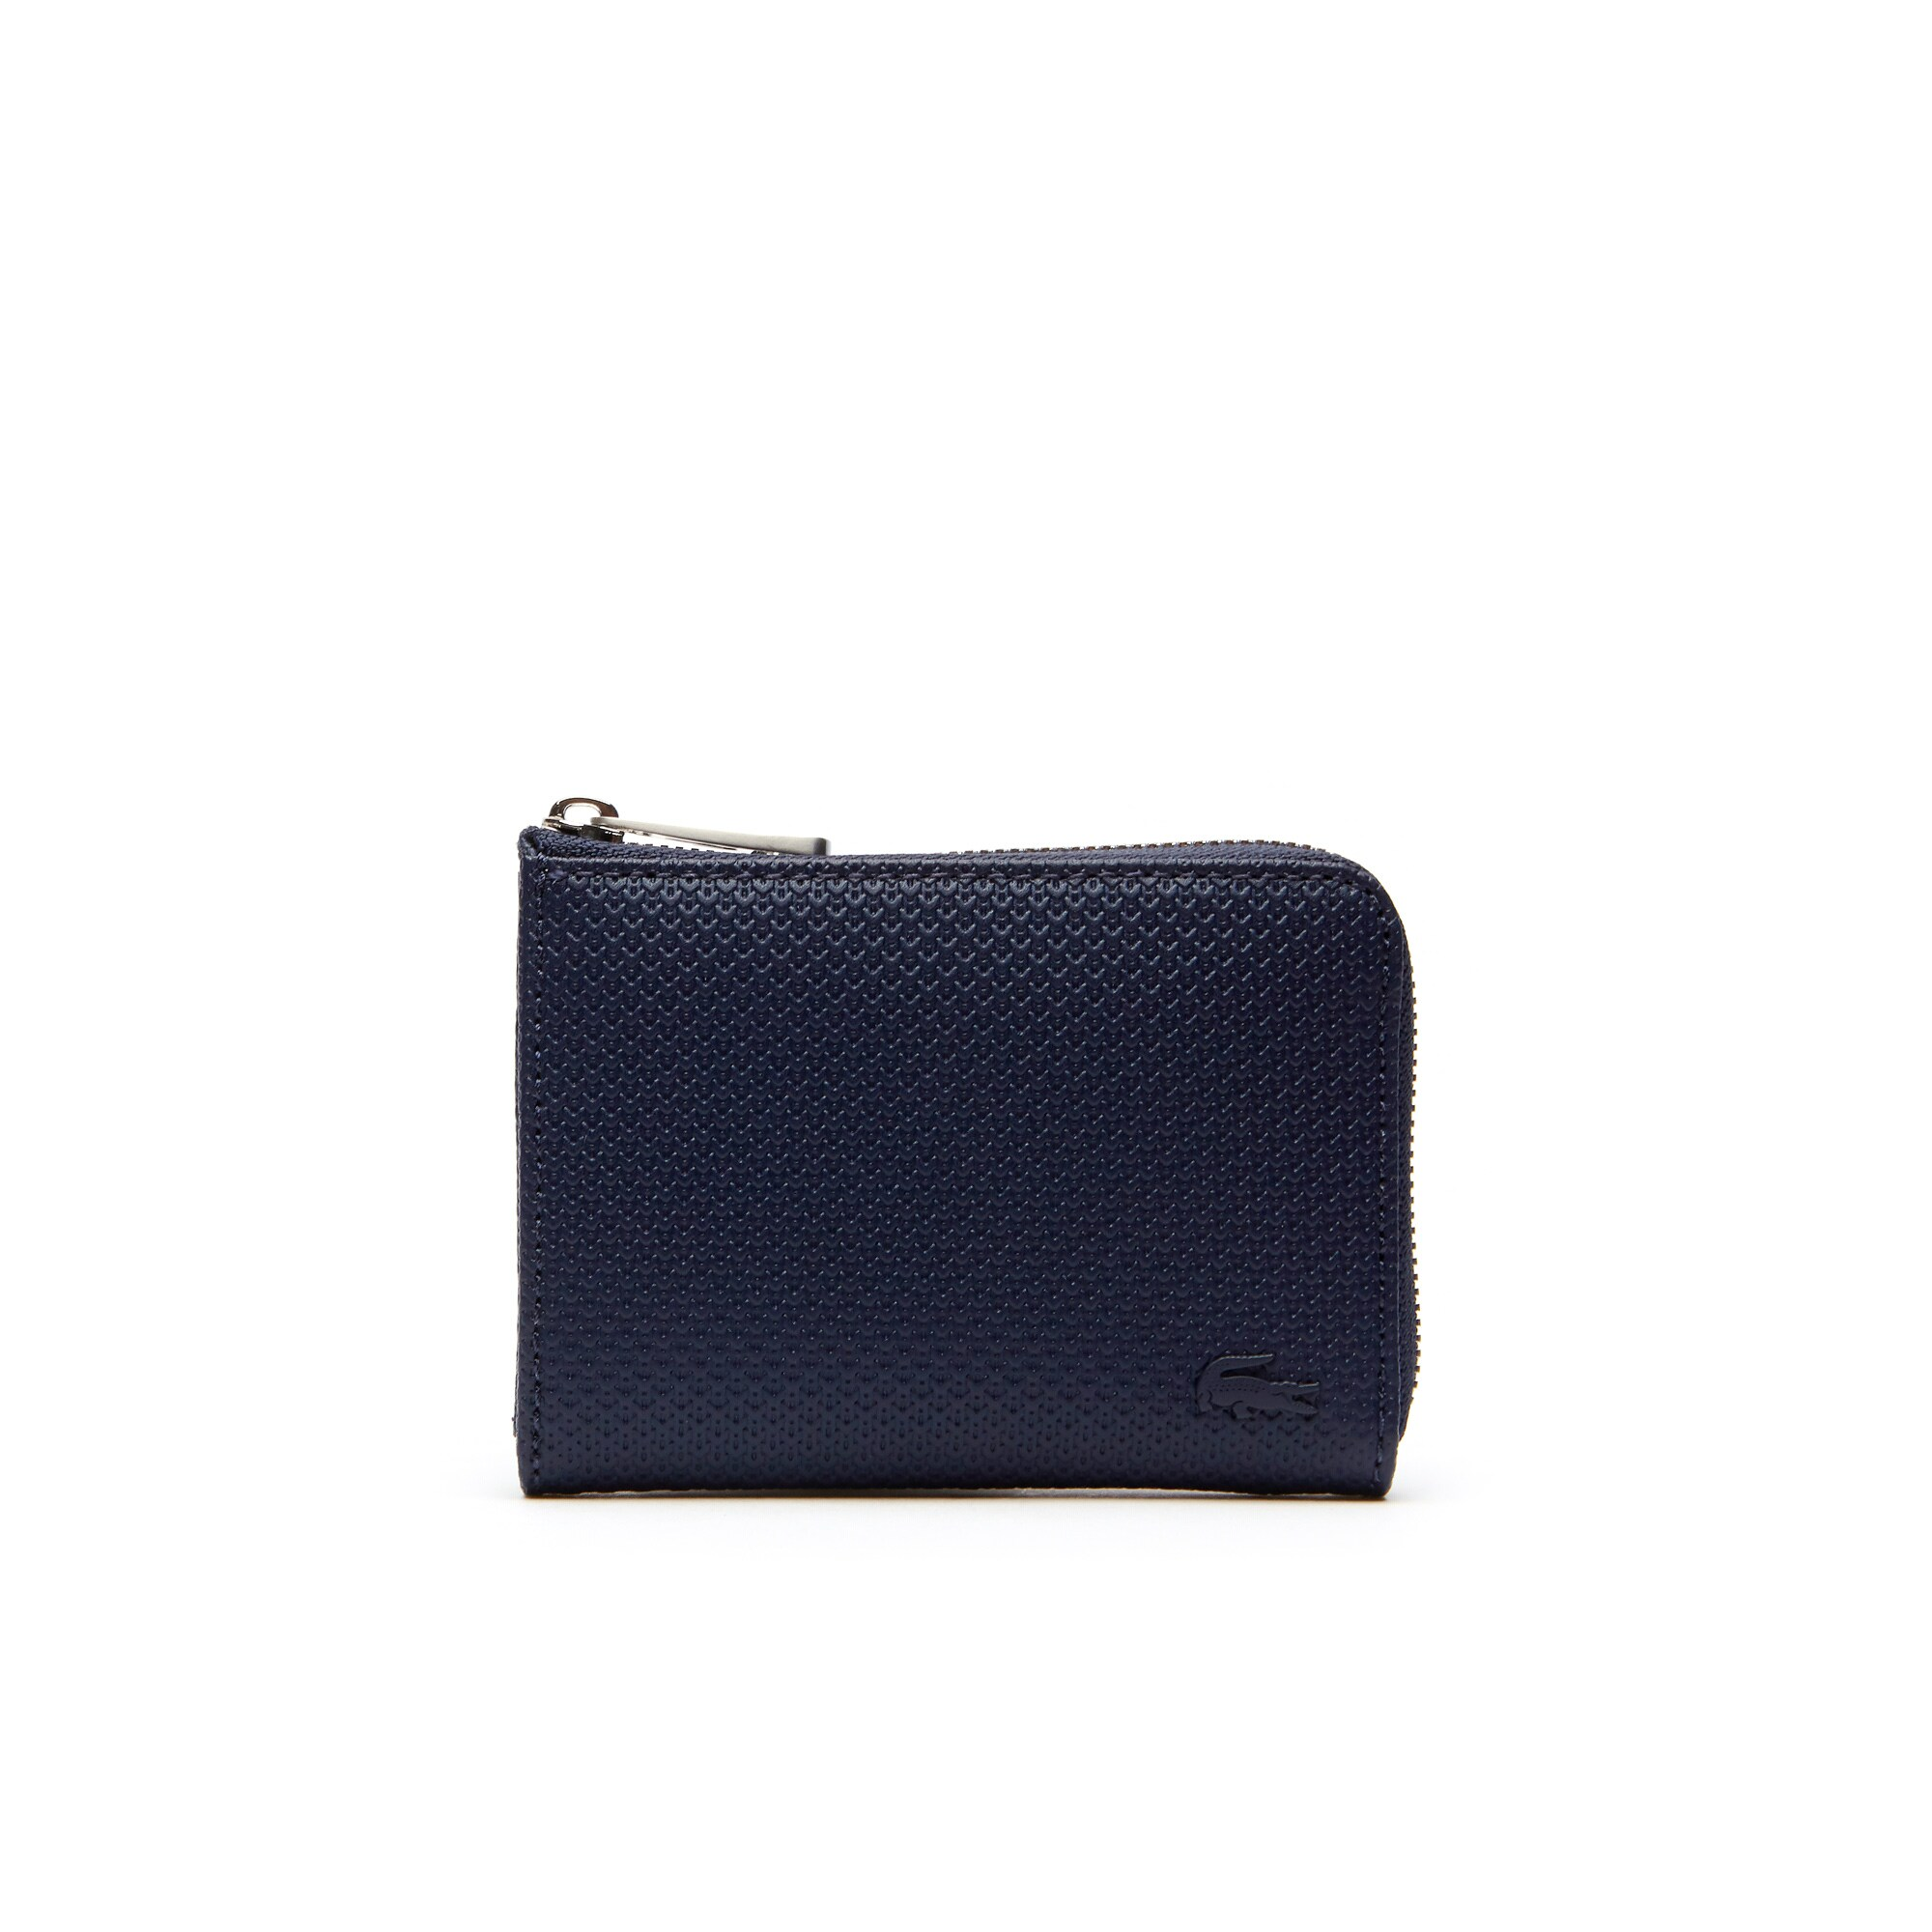 Men's Chantaco Matte Piqué Leather Zip Card Holder